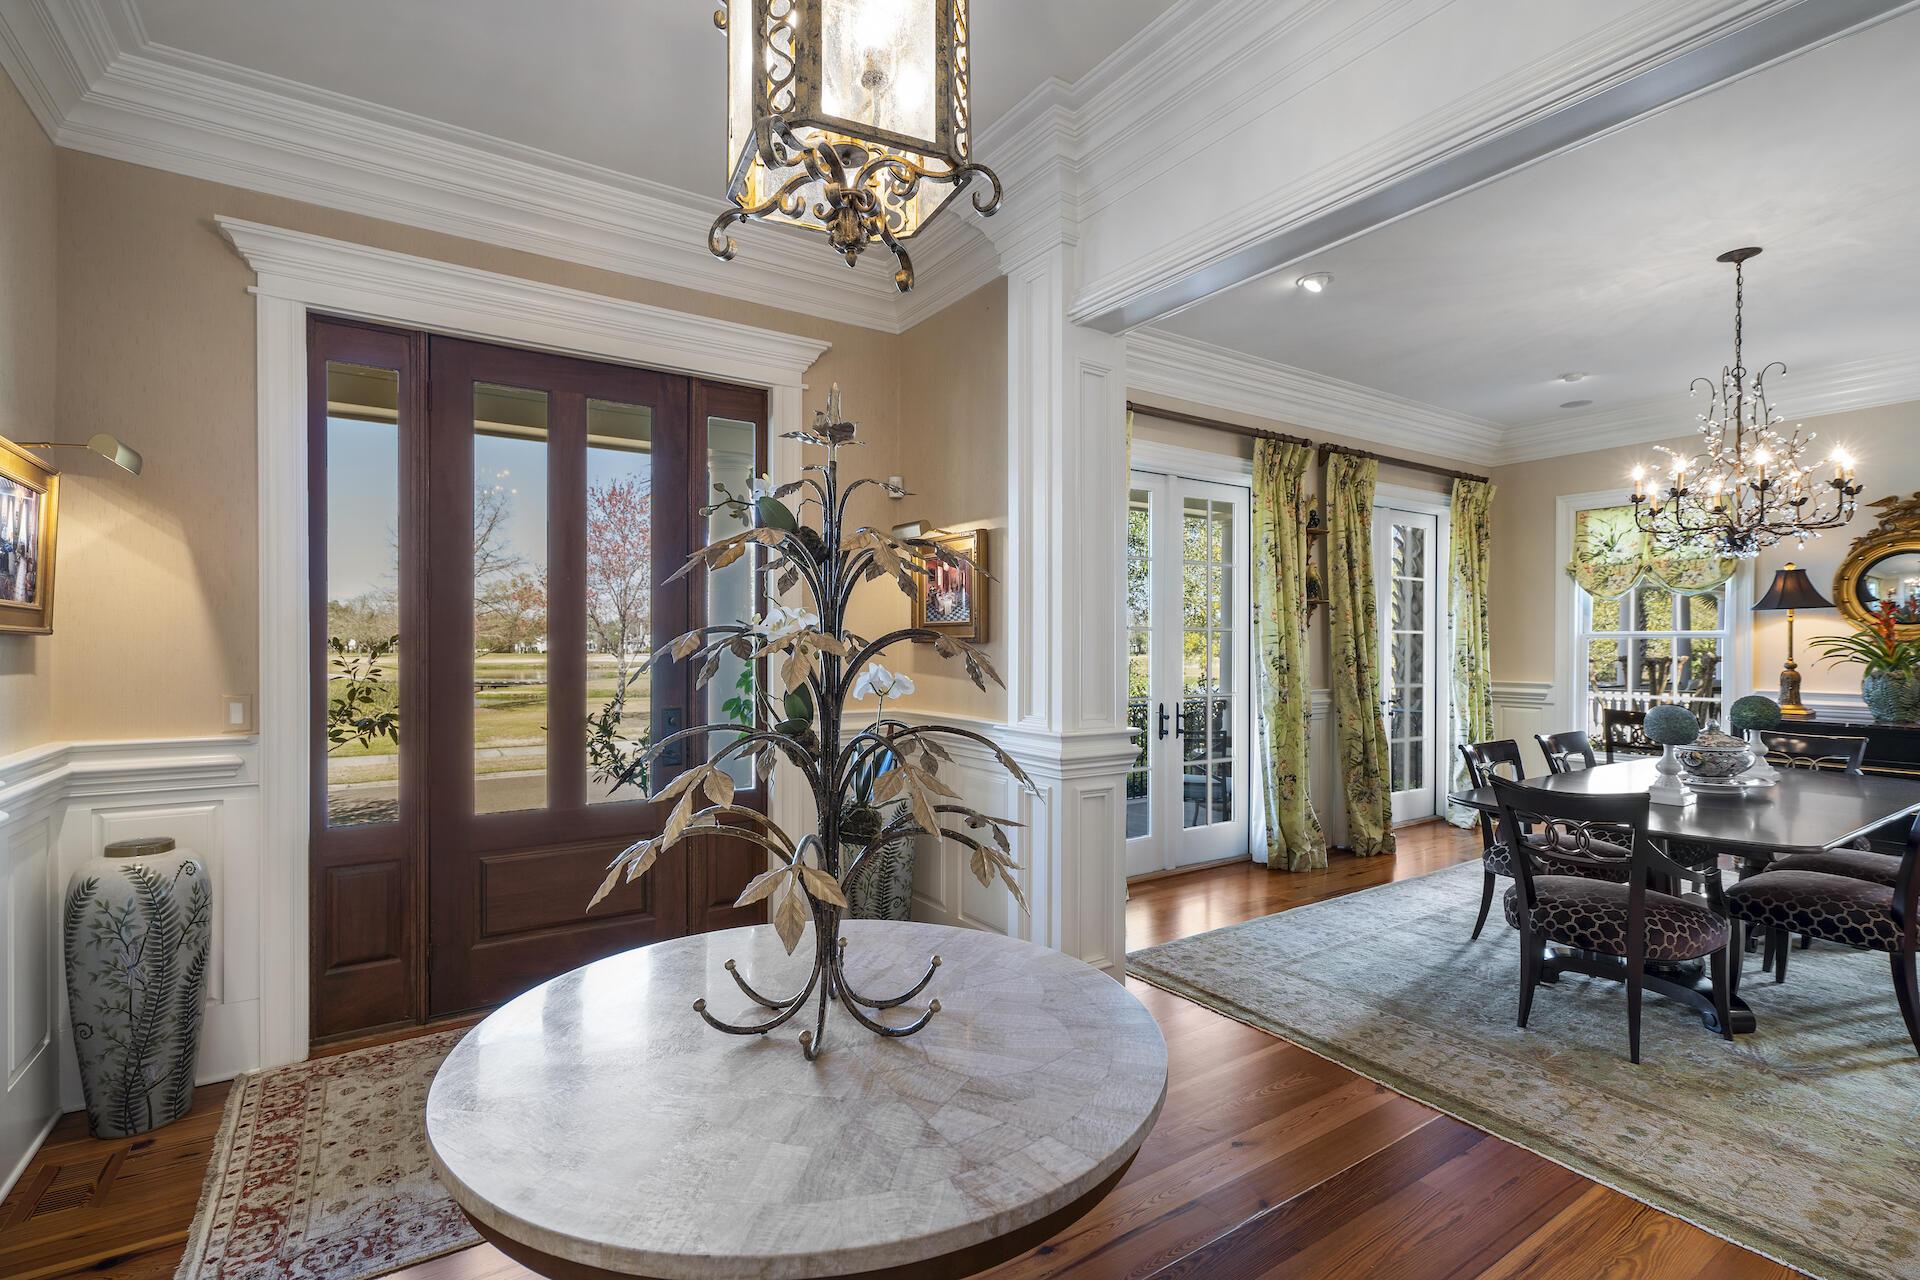 Daniel Island Homes For Sale - 623 Island Park, Charleston, SC - 30